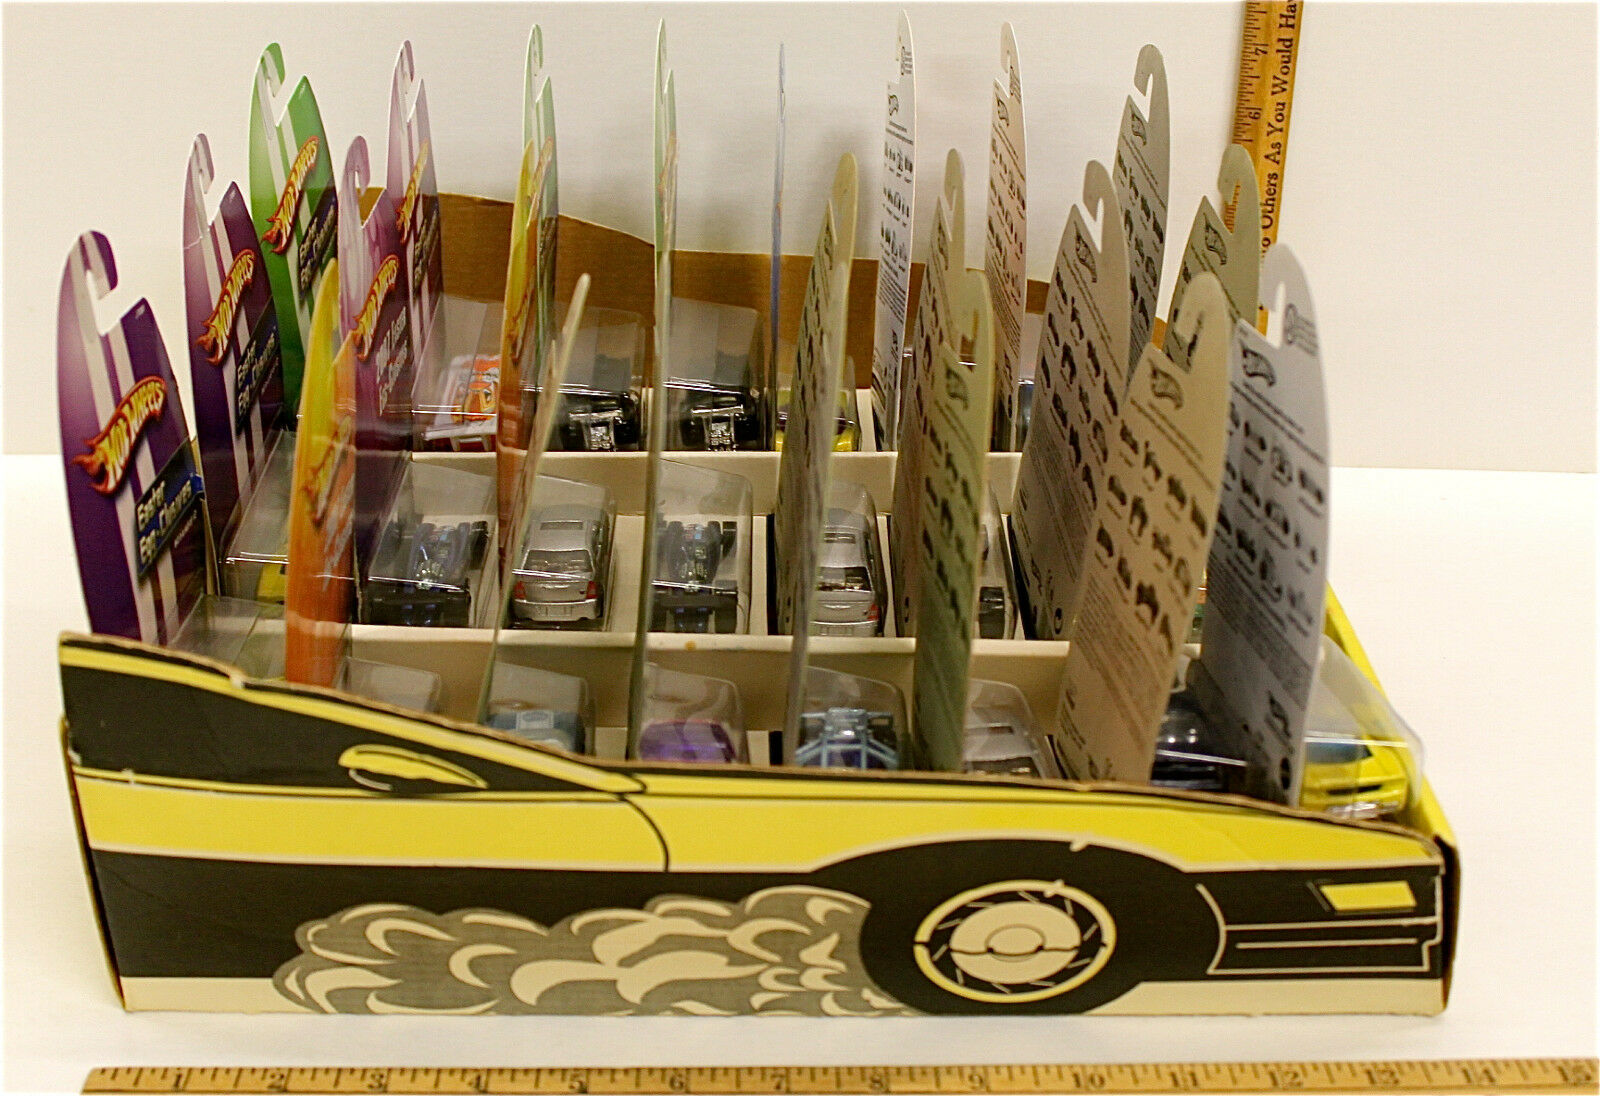 24. hot wheels osterei clusives druckguss auto w w w   fabrik zeigt die firma mattel noc 3cd369